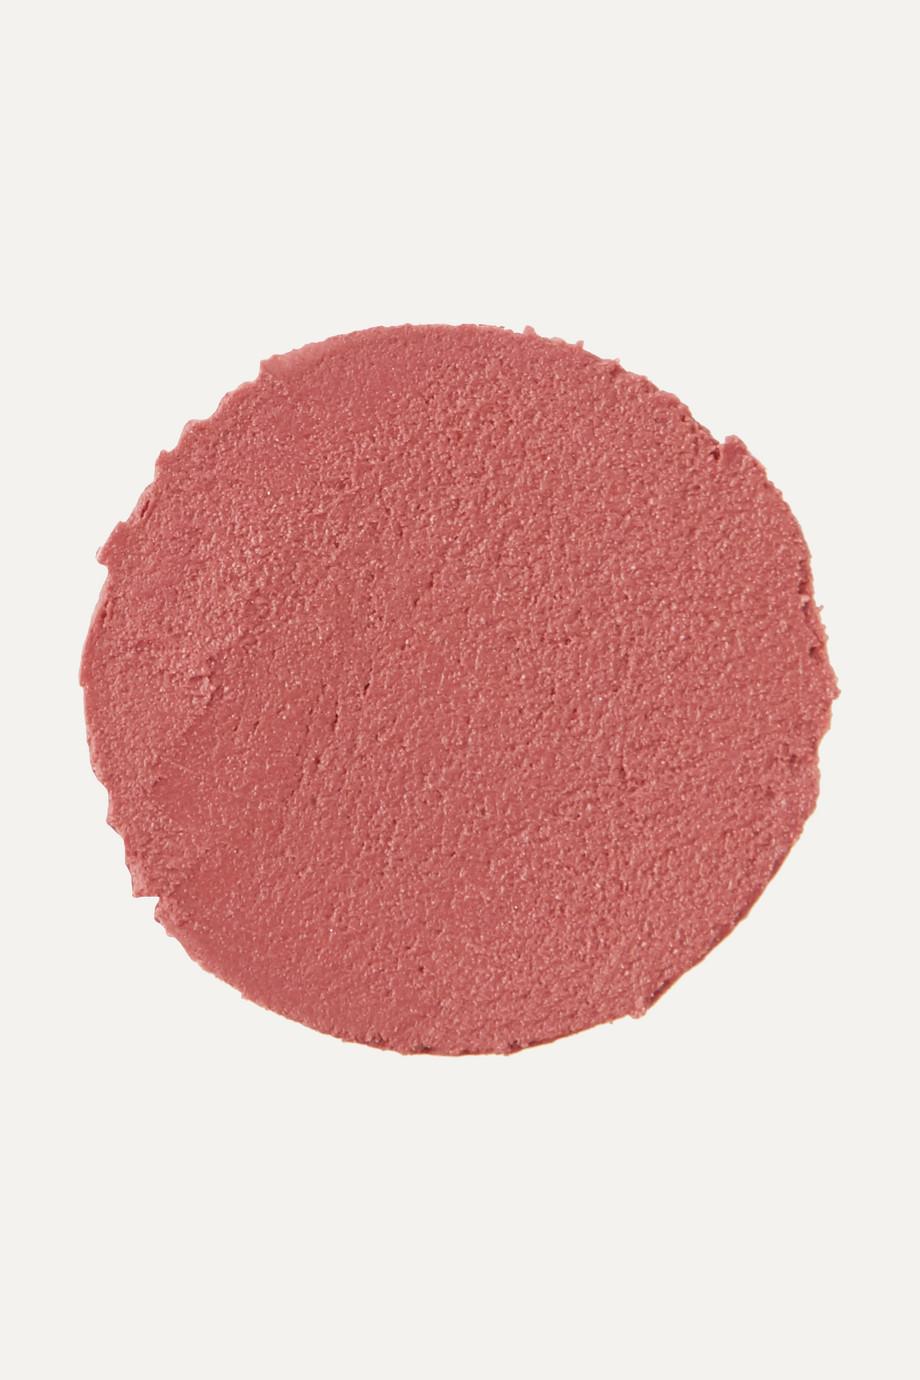 Bobbi Brown Crushed Lip Color - Bare